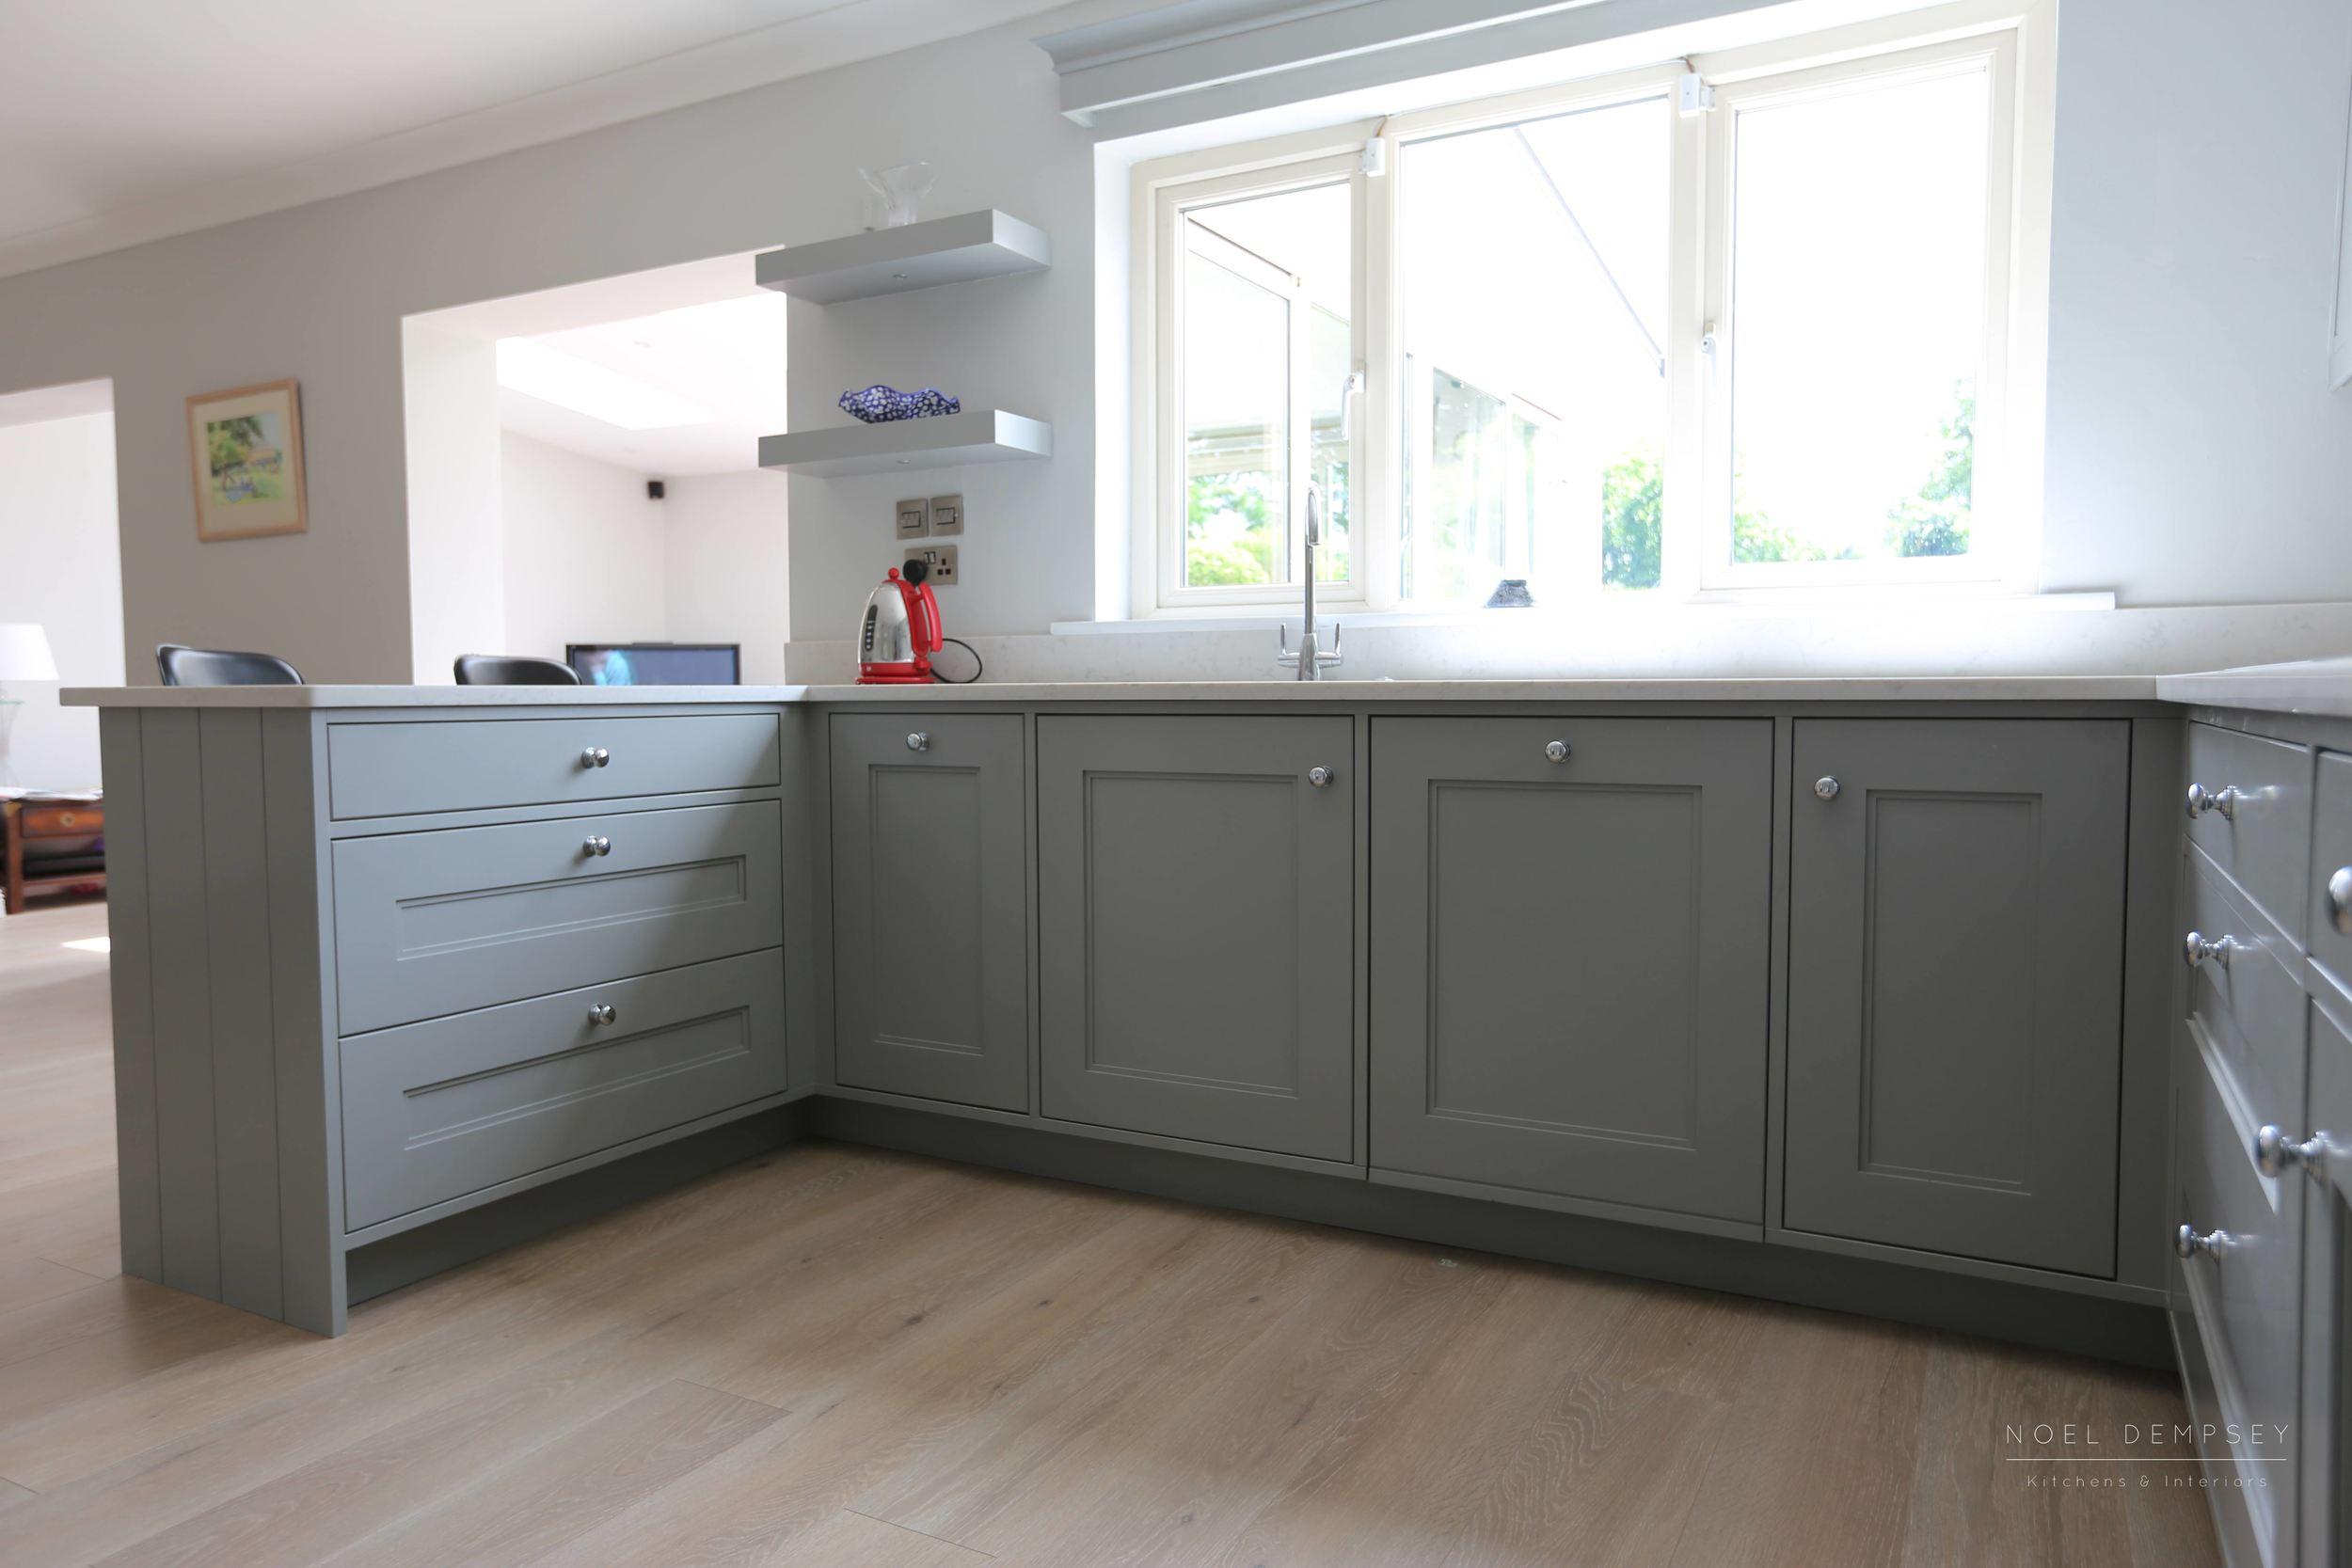 Foxrock-kitchens-3.jpg